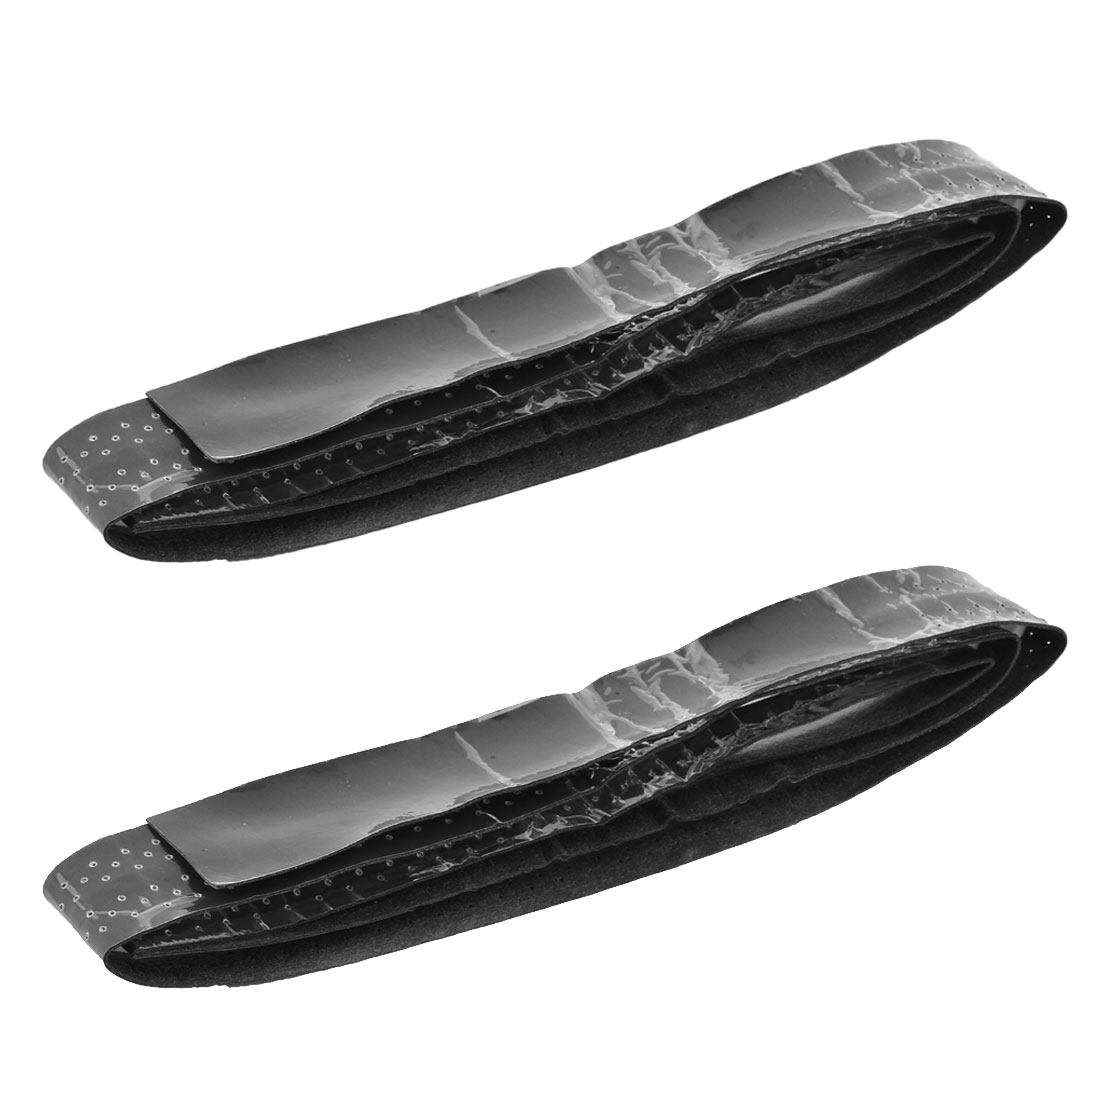 Outdoor Badminton Foam Self Adhesive Racket Handle Grip Belt Band Tape Black 2pcs